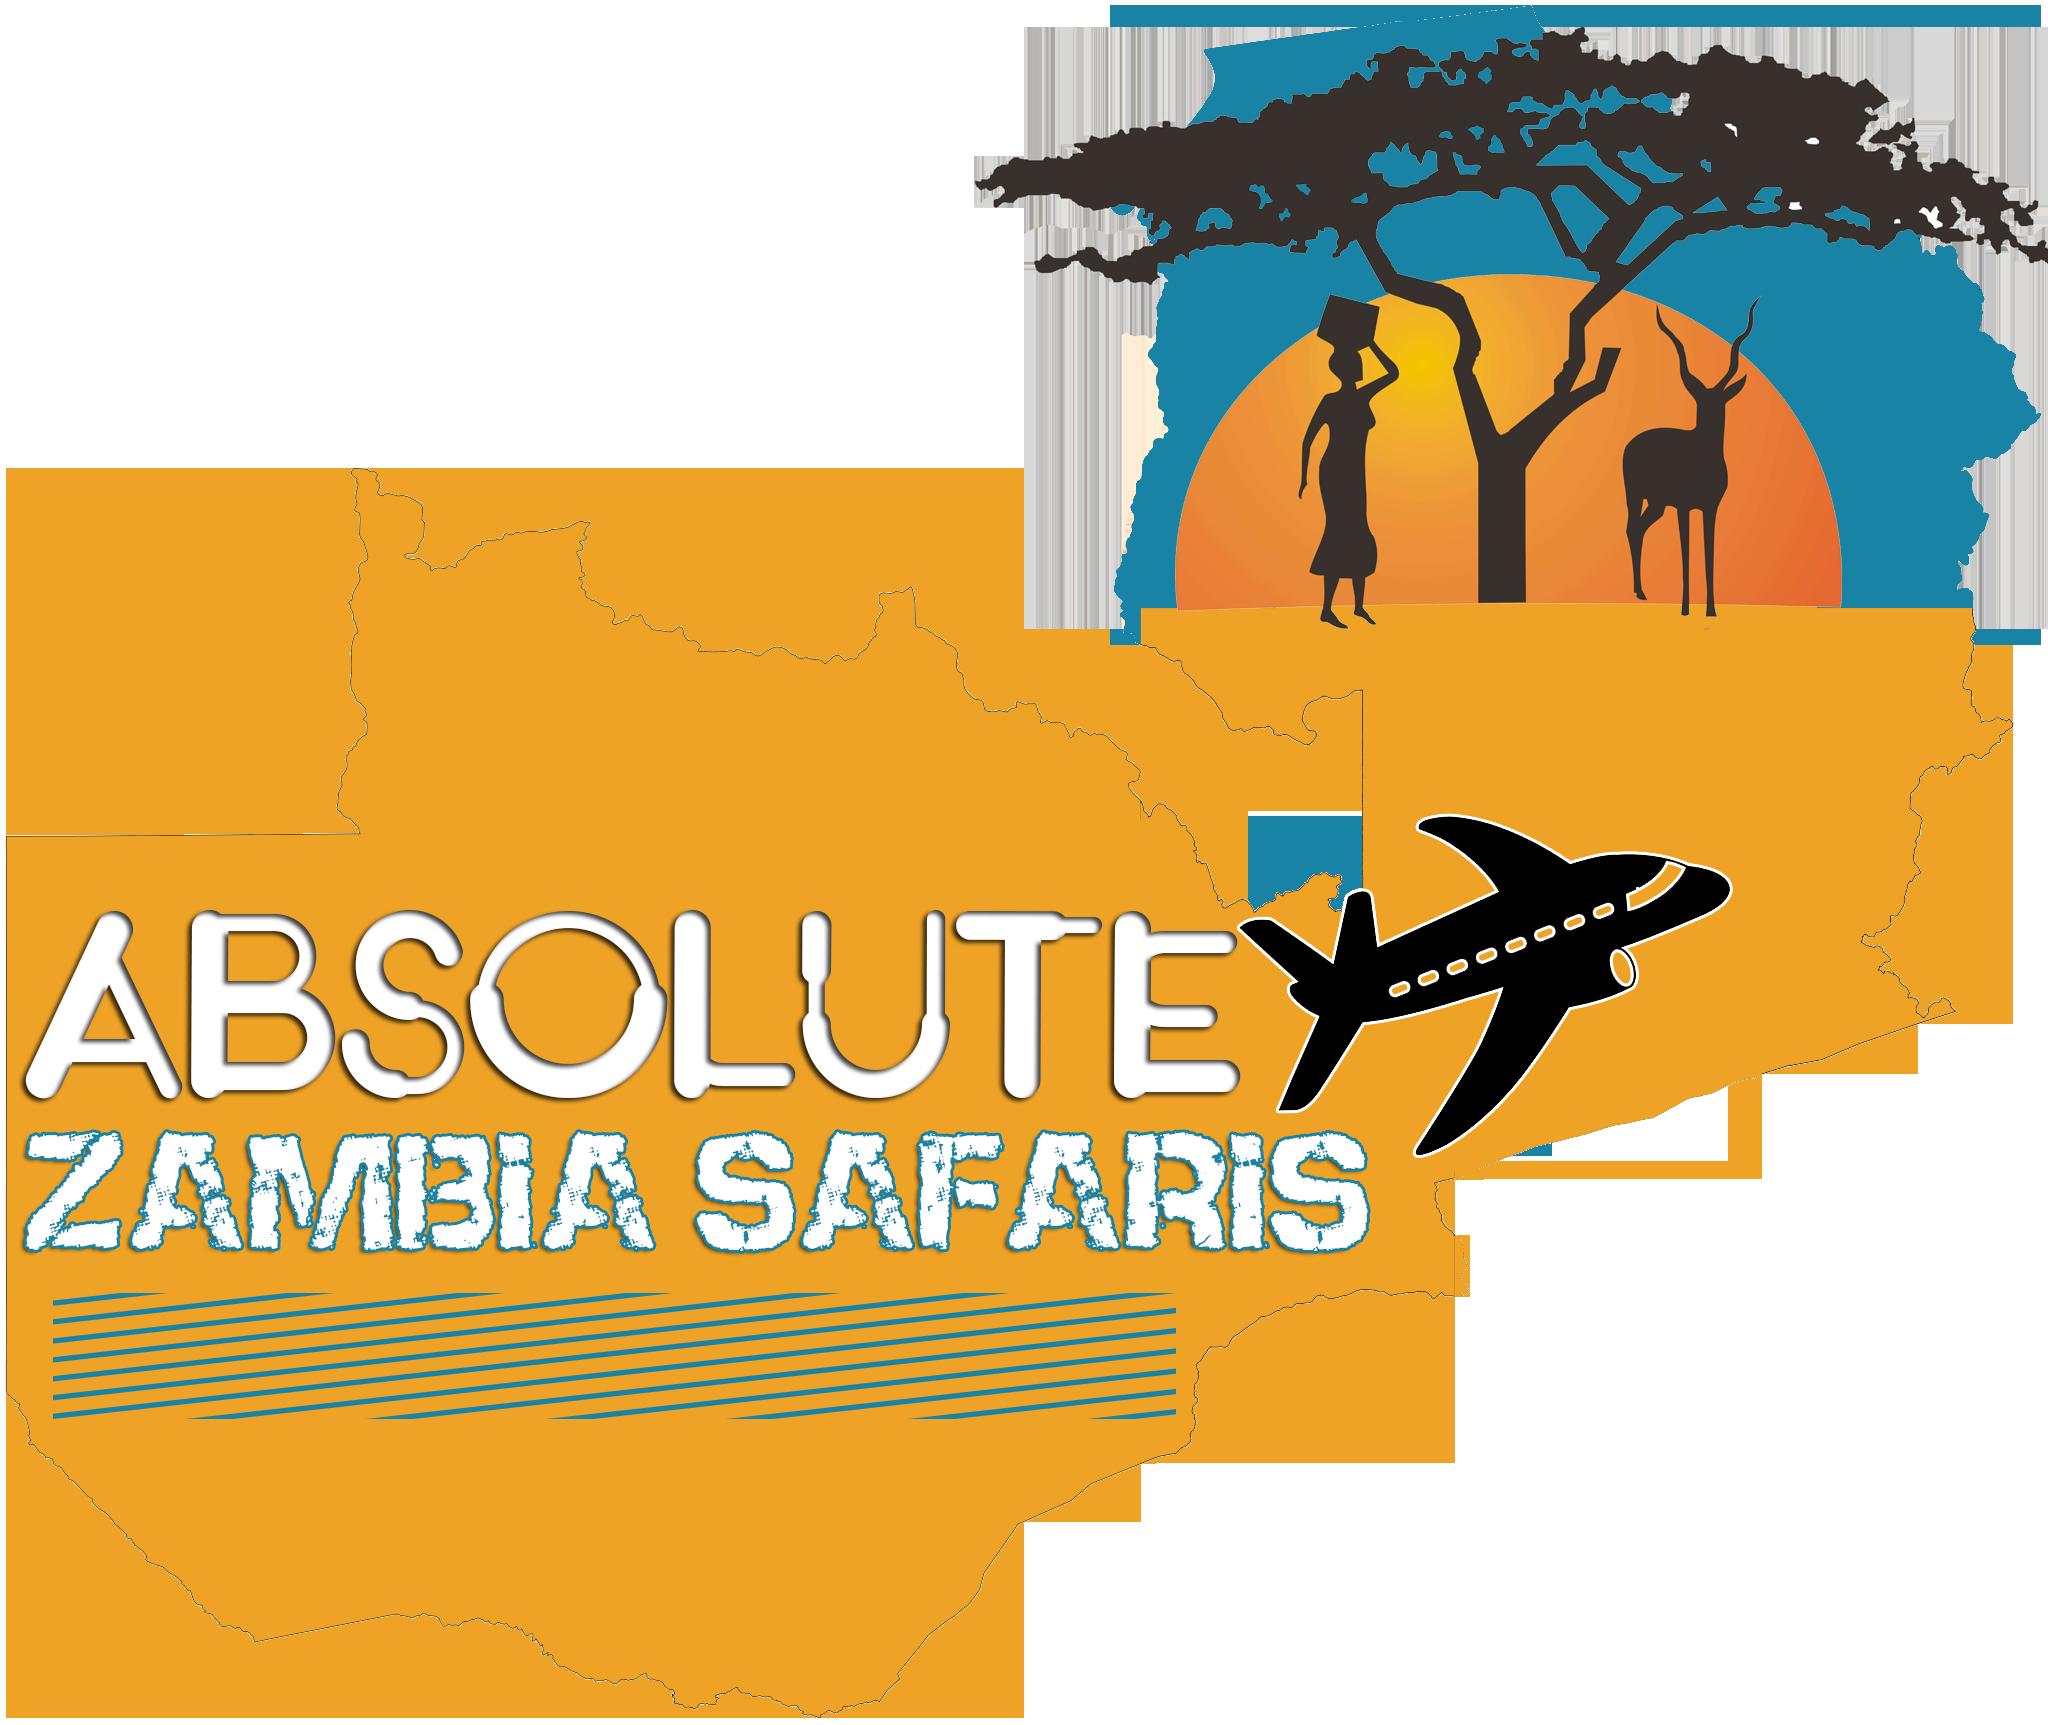 Absolute Zambia Safaris, Ltd, Eastern Province, Zambia